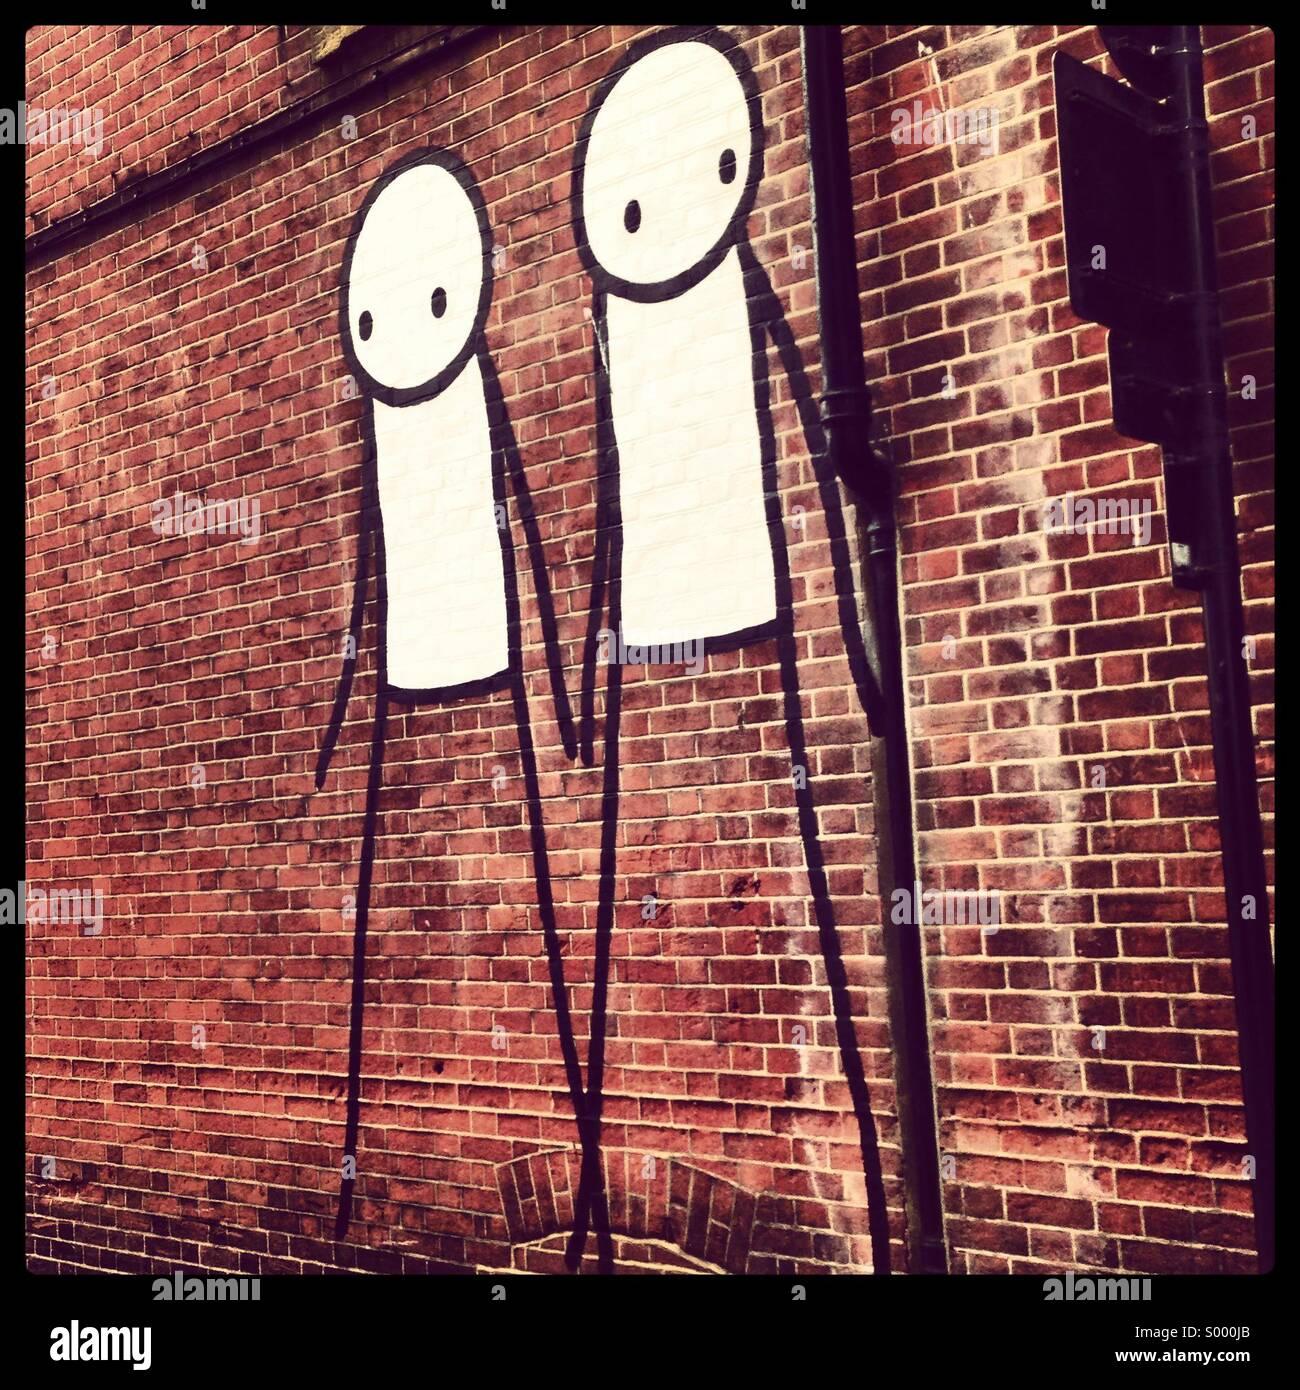 Graffiti, Chichester, UK - Stock Image